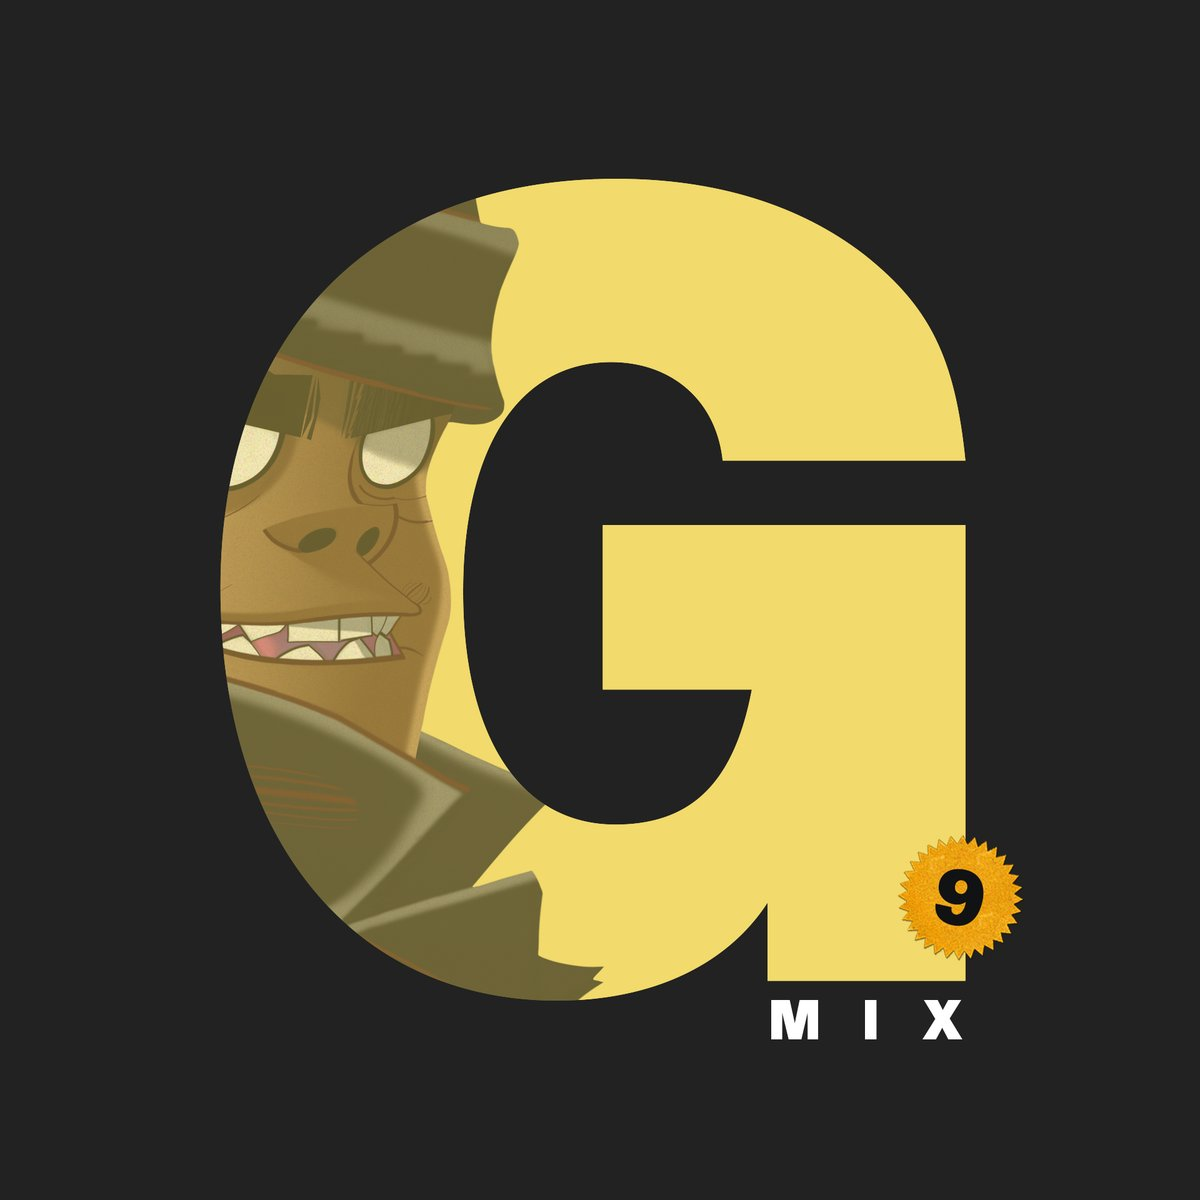 G-Mix: Russel 9